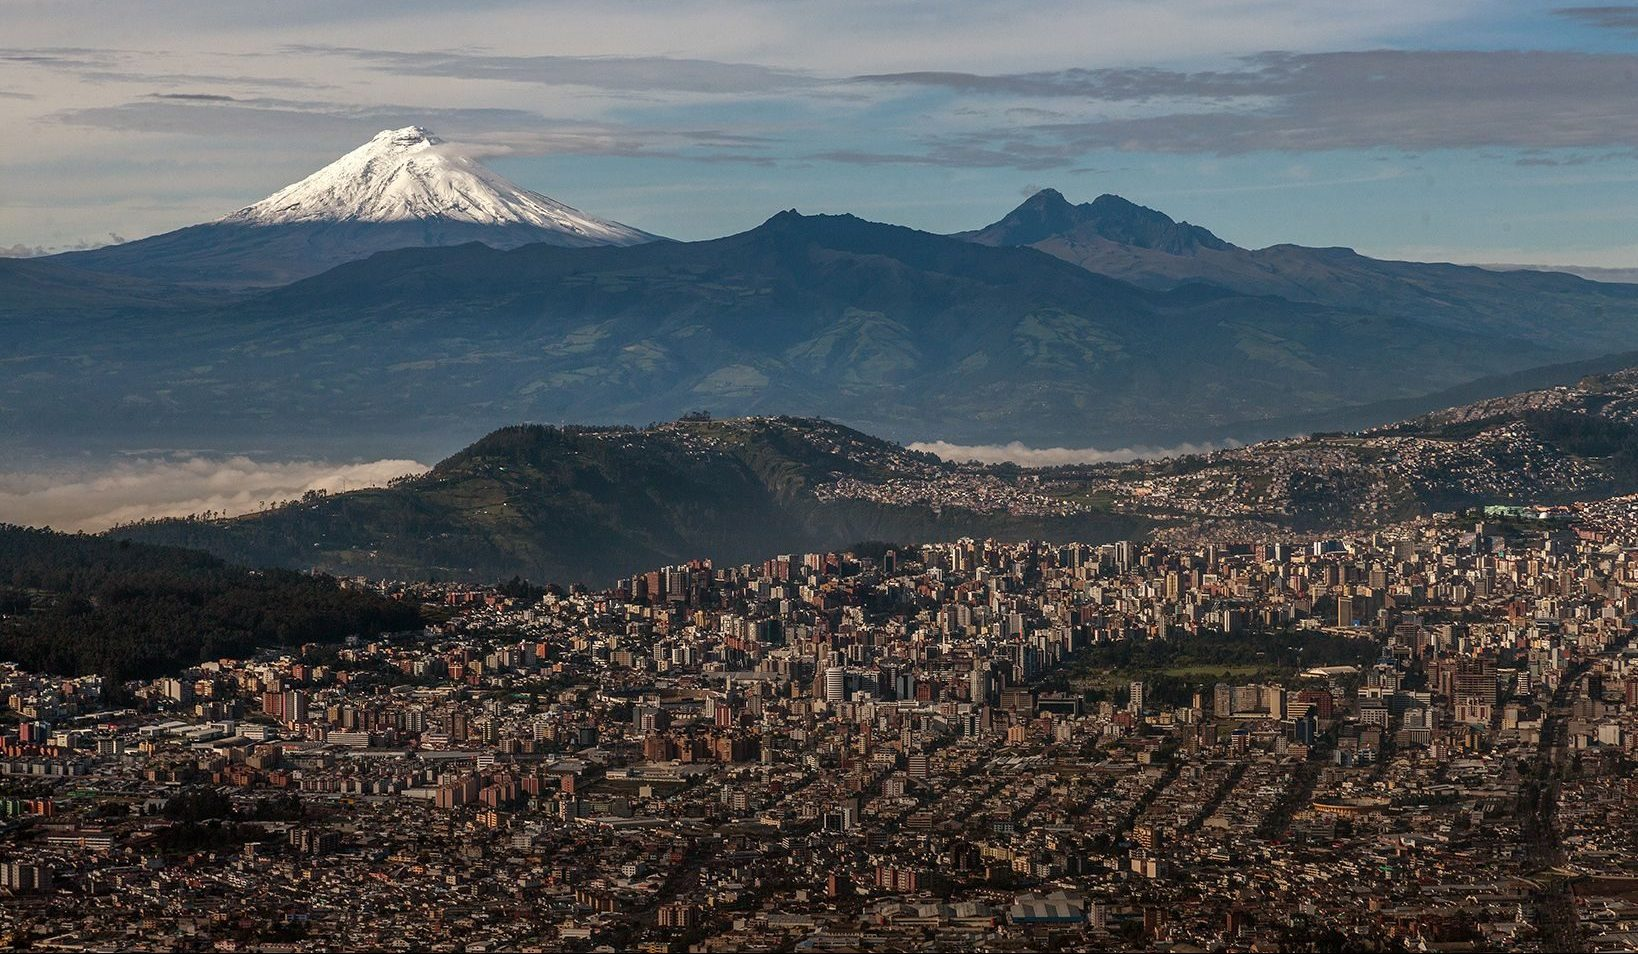 Quito, Cotopaxi, Ecuador, Pichincha, South America